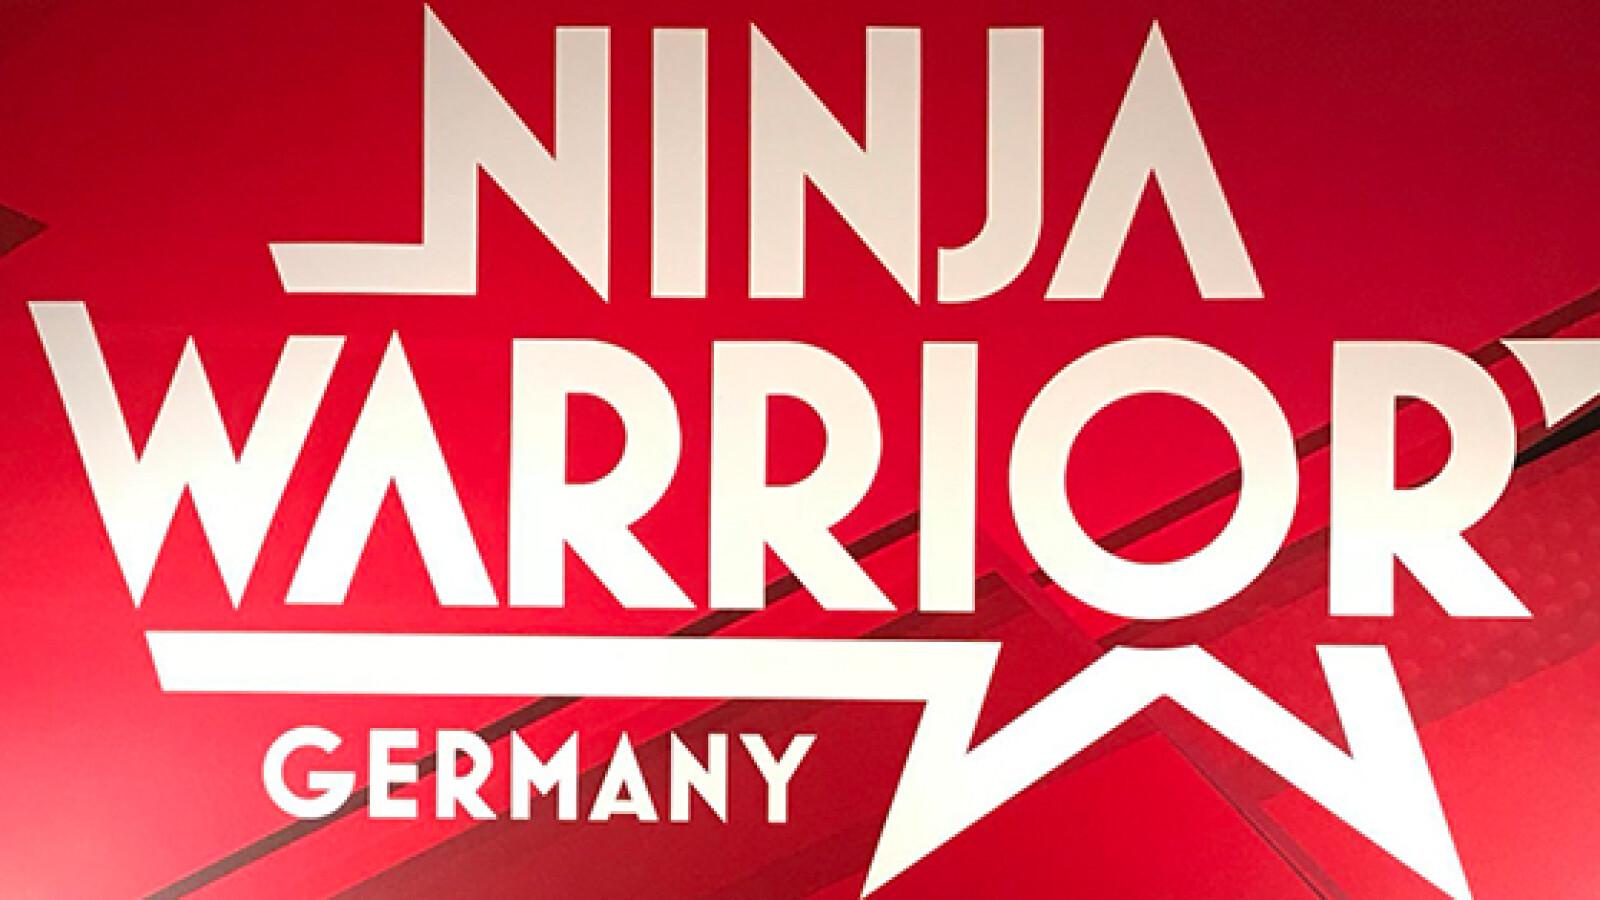 Ninja Warrior Germany Stream